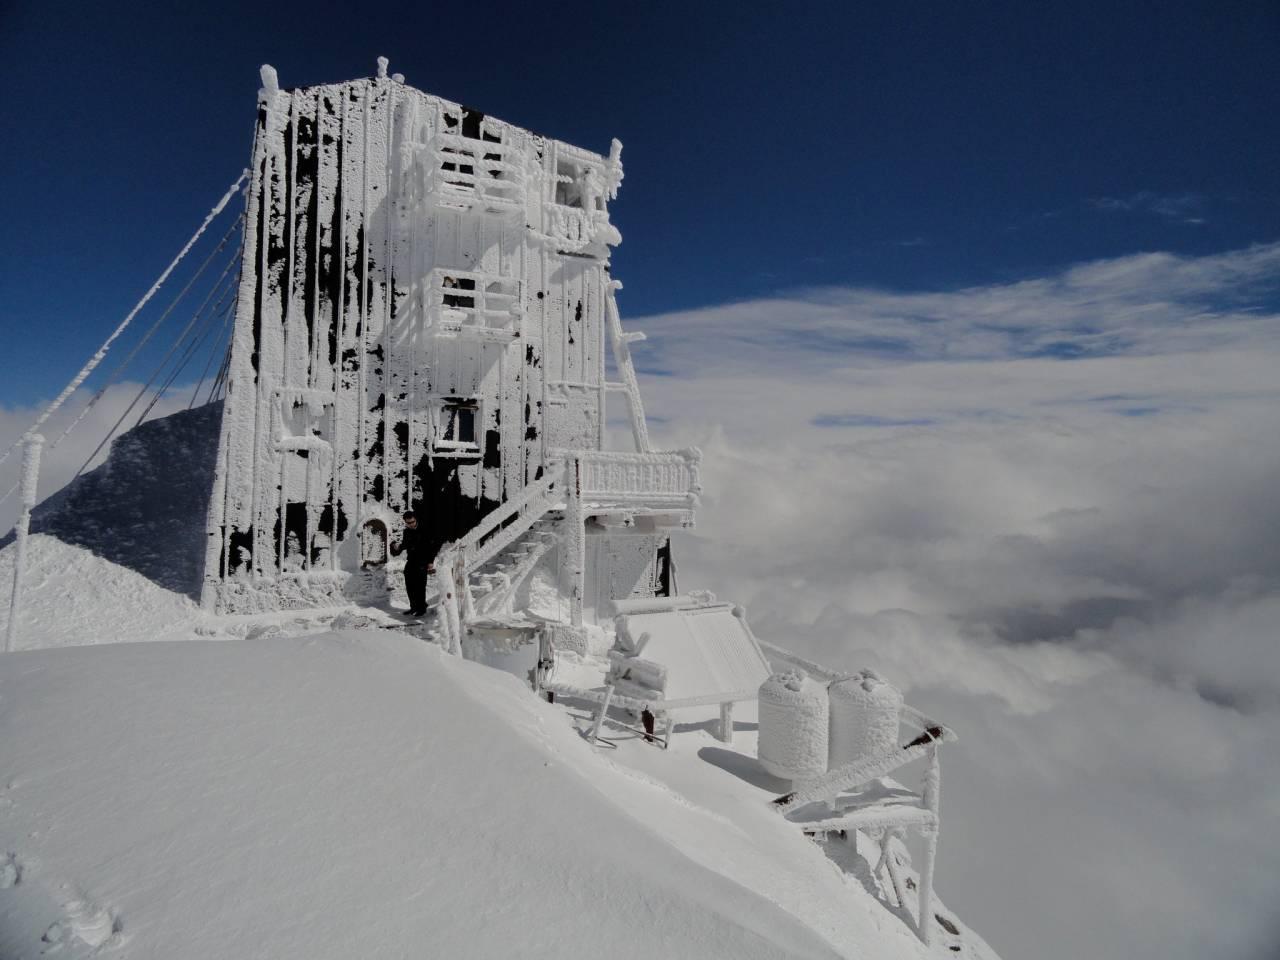 La Capanna Margherita sul Monte Rosa (Fonte immagine Capanna Margherita via Facebook)